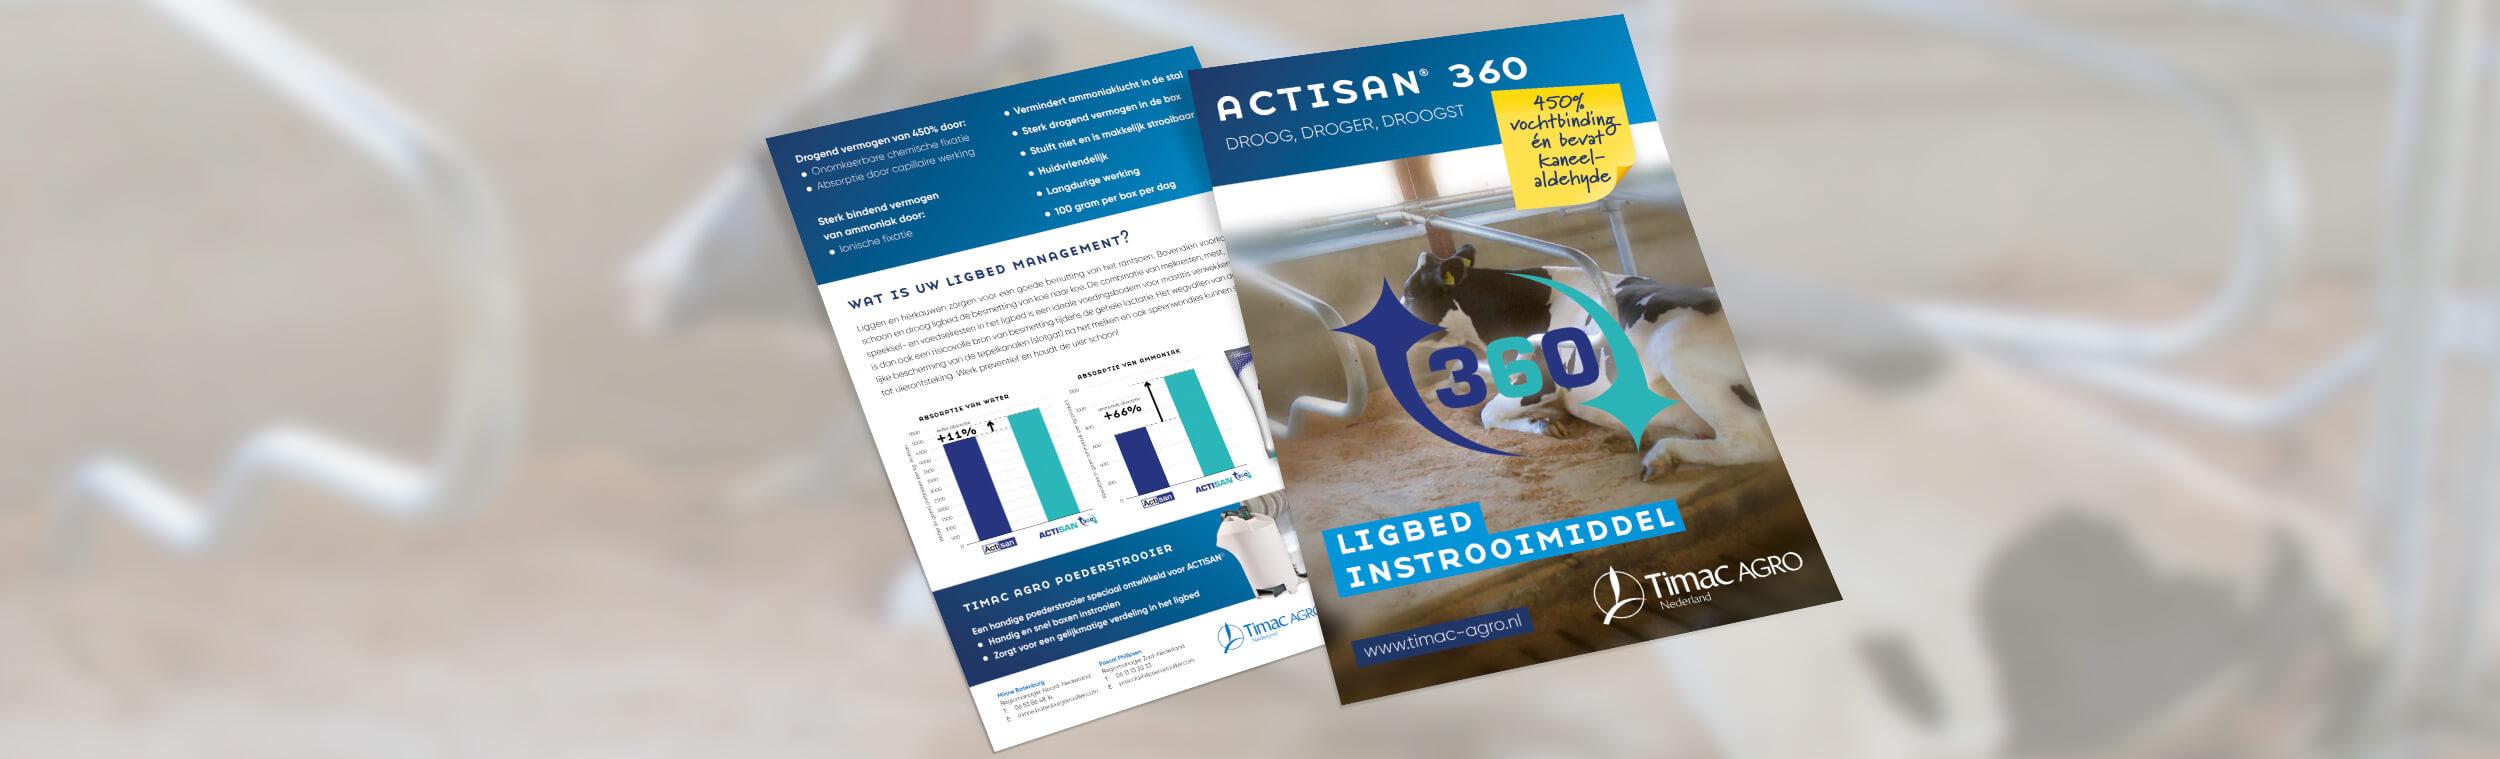 Timac Agro | Actisan 360 - Flyer